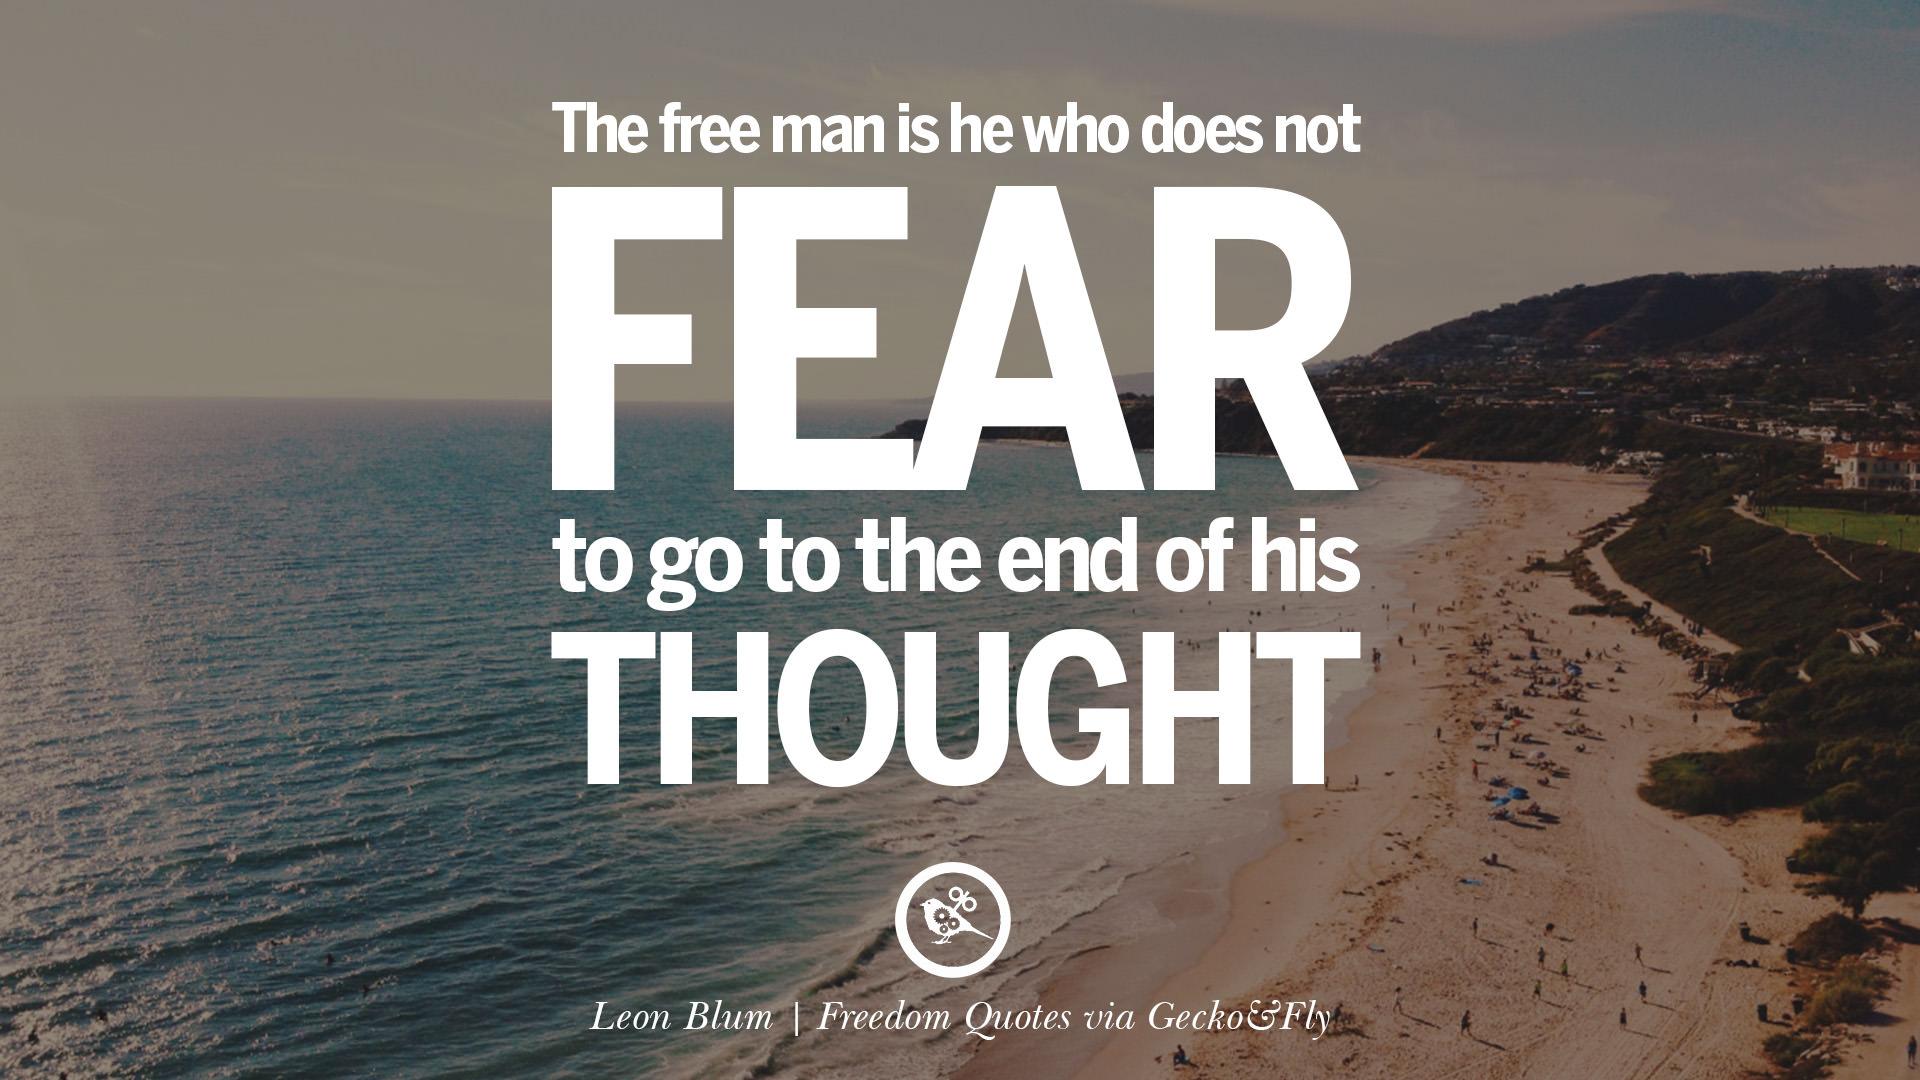 Thomas jefferson quotes on freedom